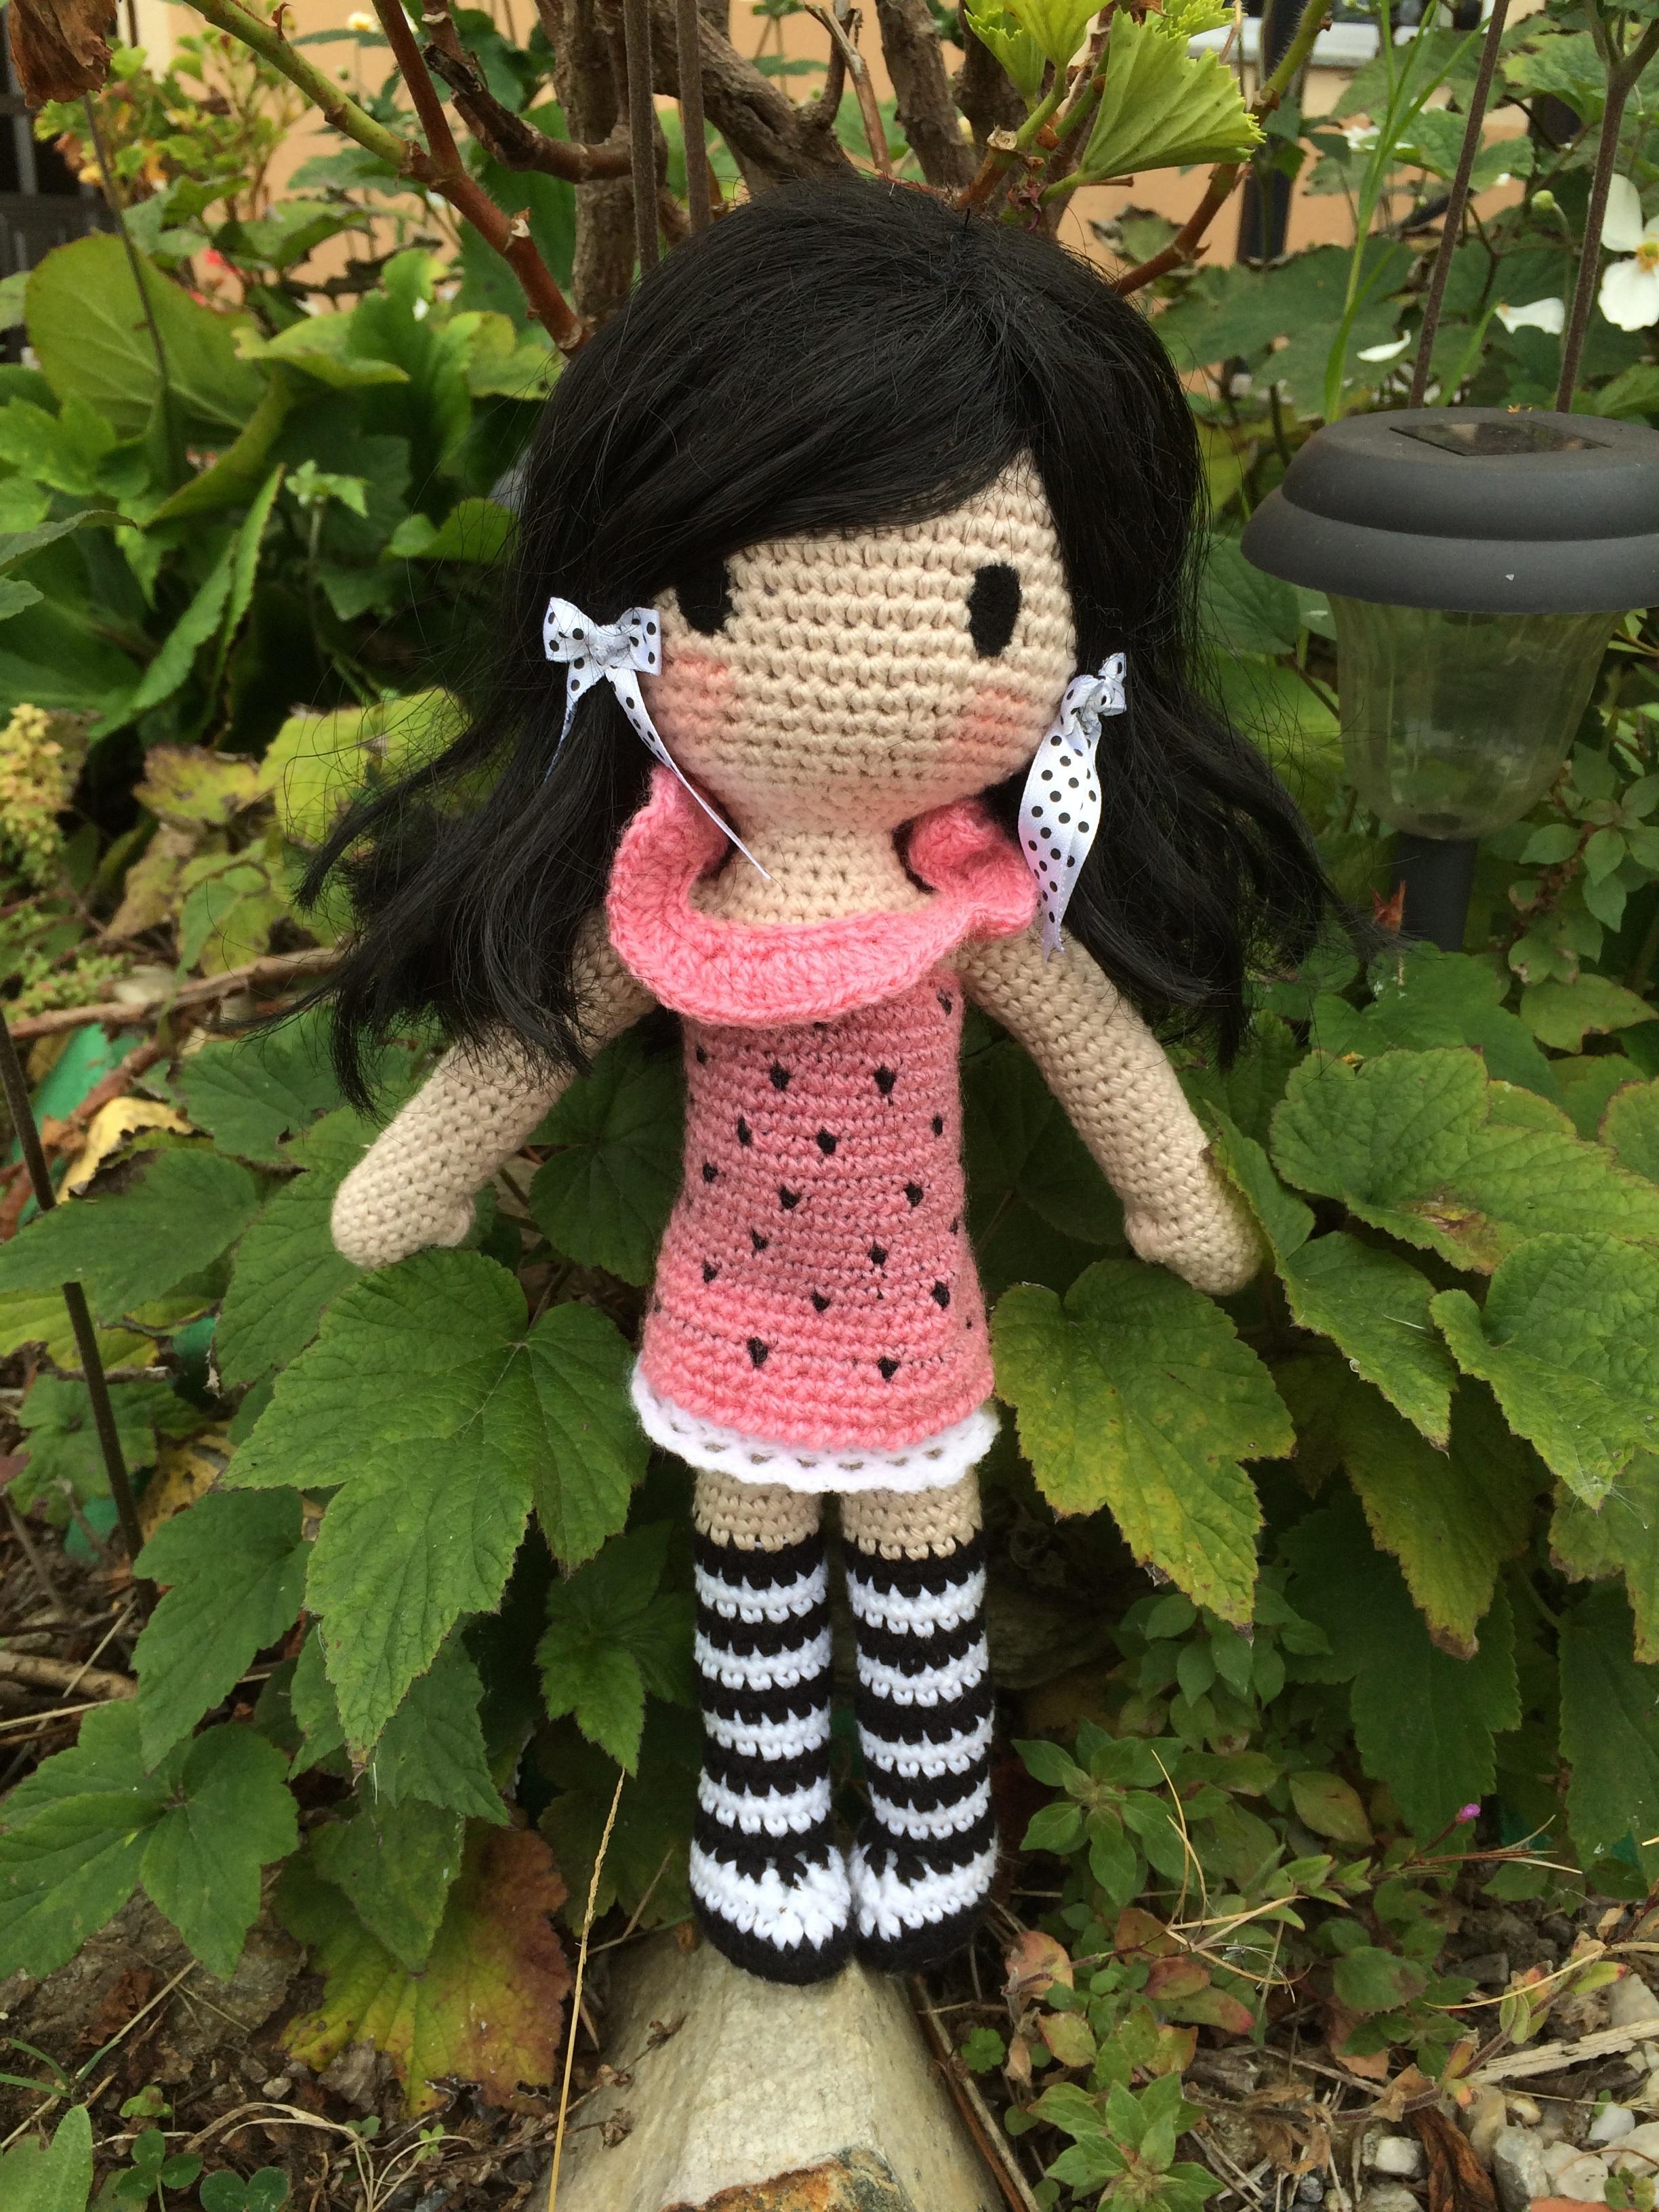 Fotos gratis : flor, verde, otoño, agricultura, juguete, hilo, lana ...